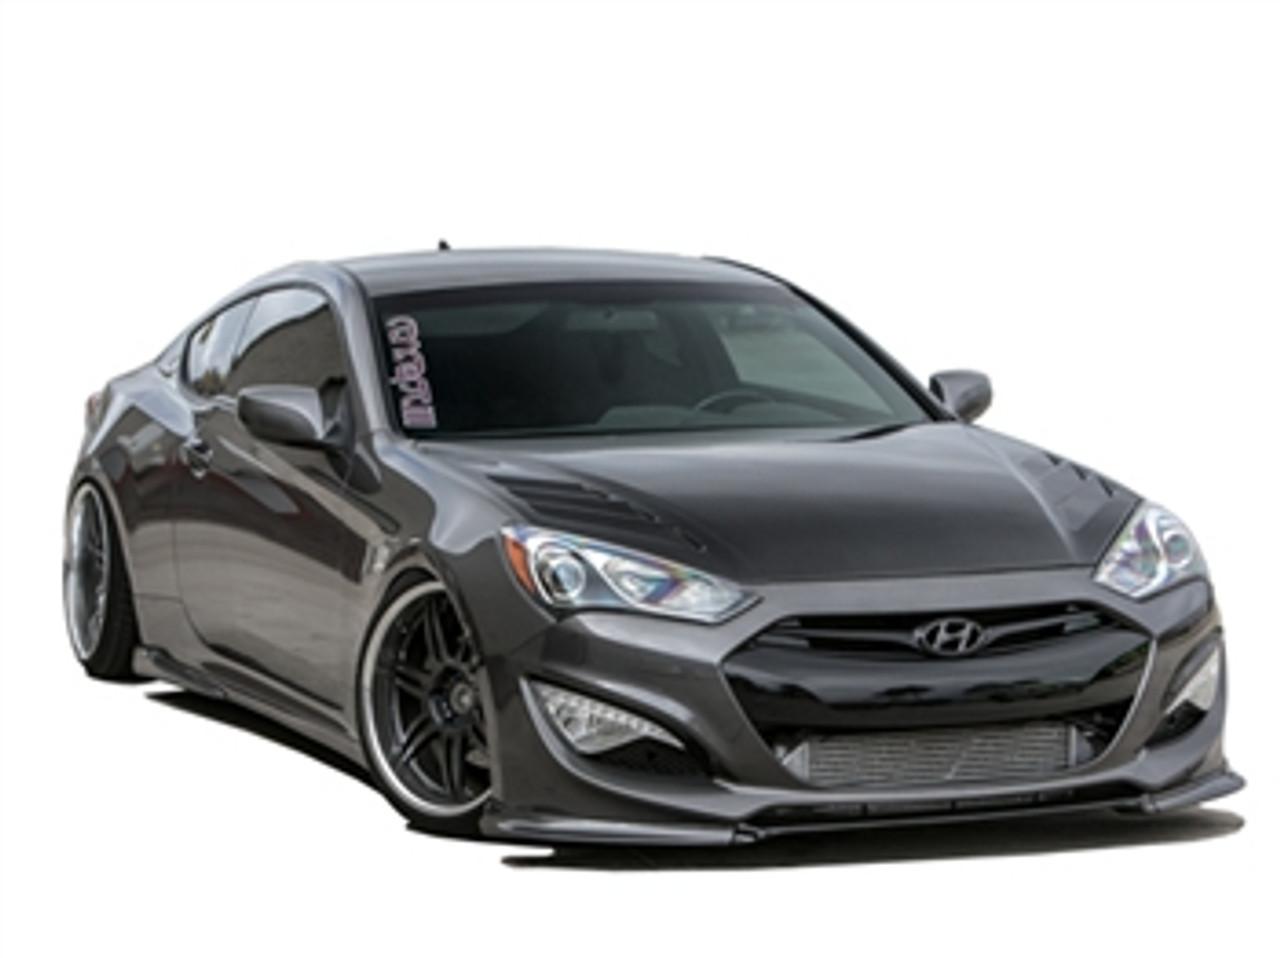 medium resolution of rksport carbon fiber vented hood for hyundai genesis coupe 2013 2016